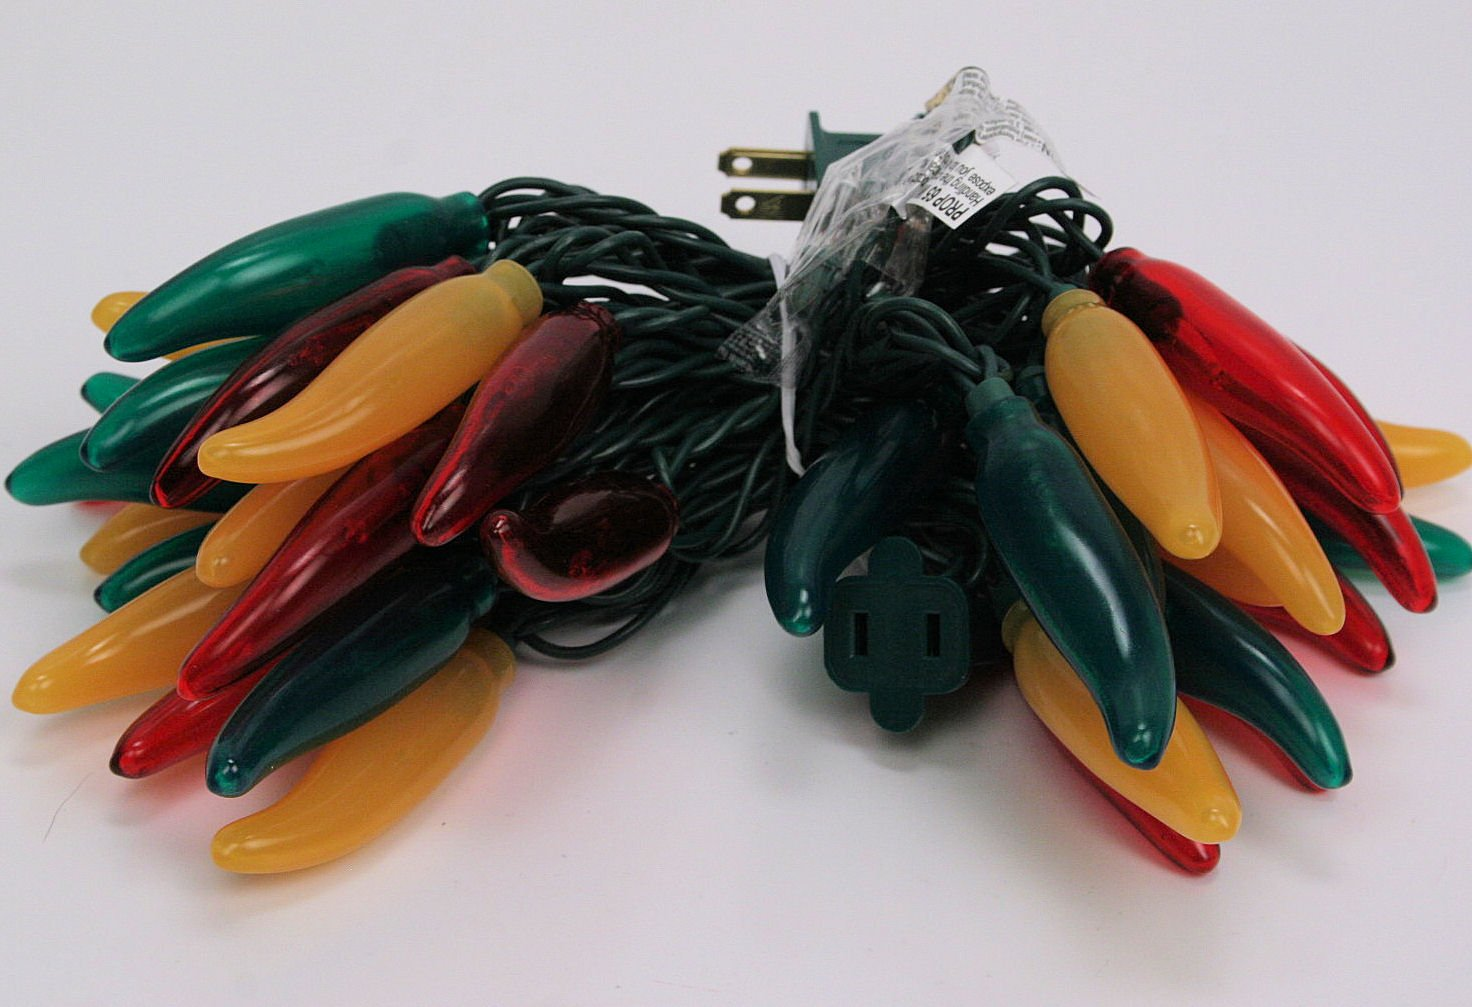 Chili Pepper Lights - Fiesta Lights - Red/Green/Yellow Set of 35